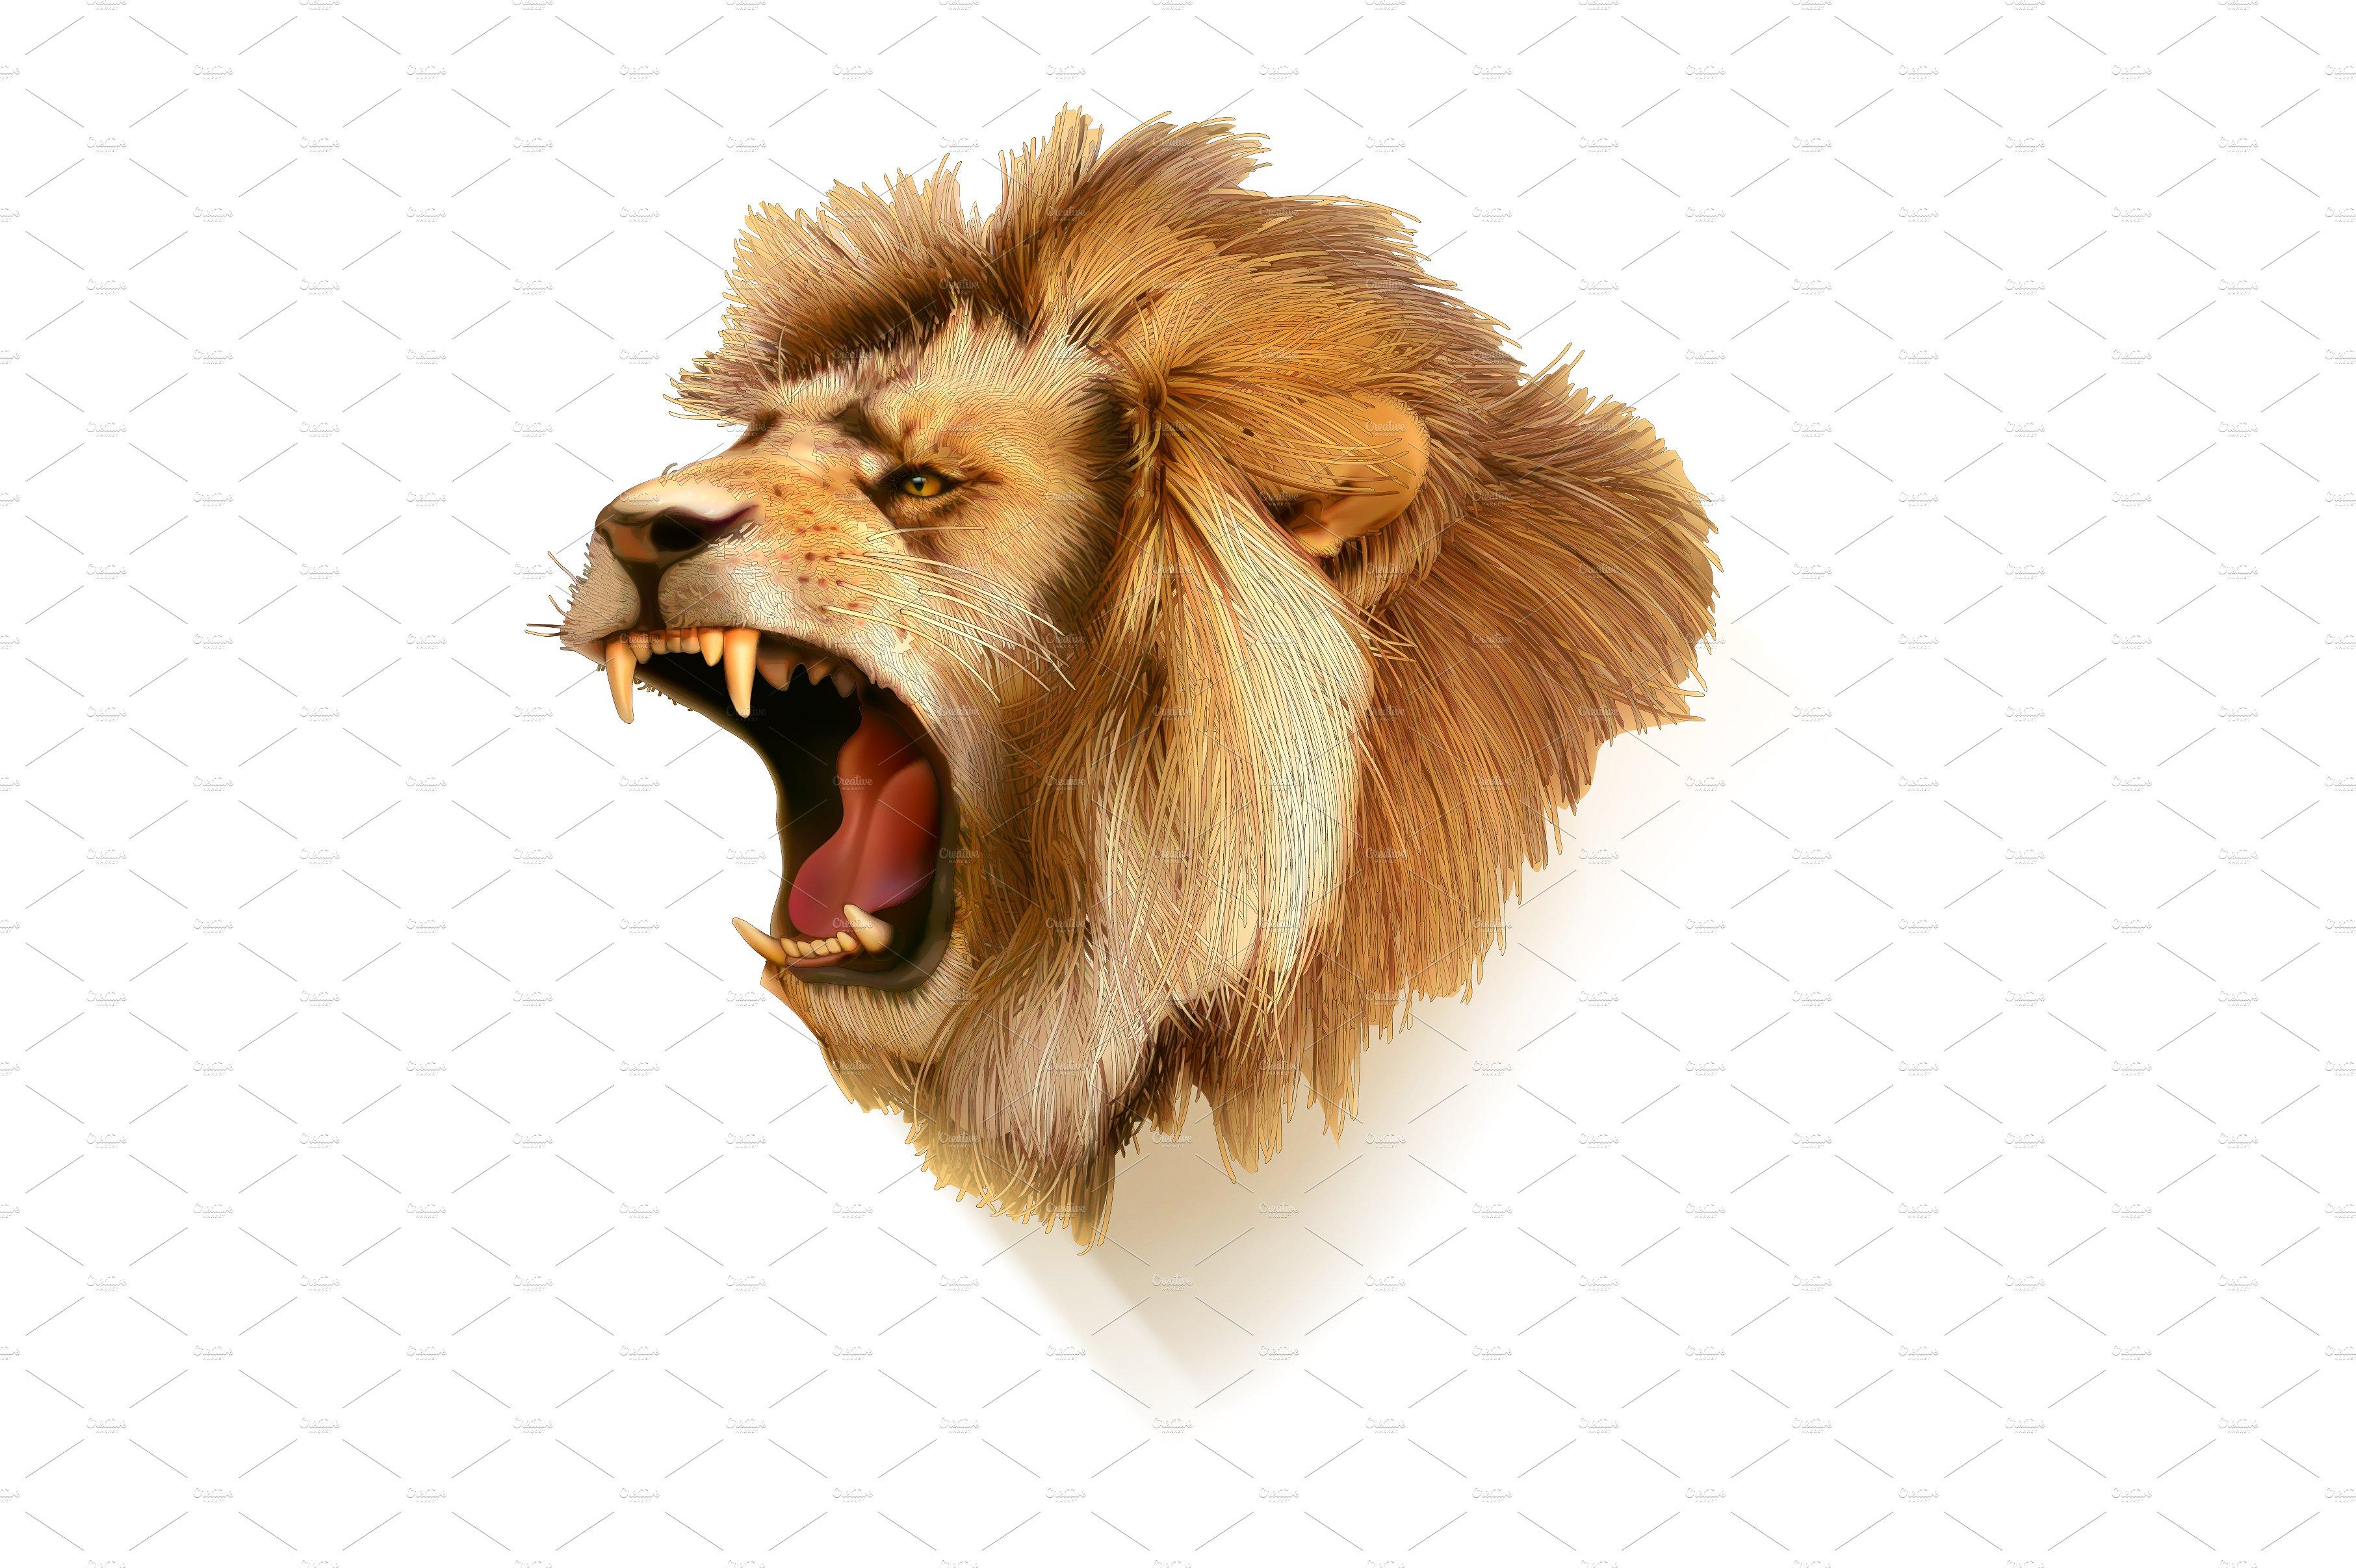 Roaring Lion Head Png & Transparent Imag #245579.